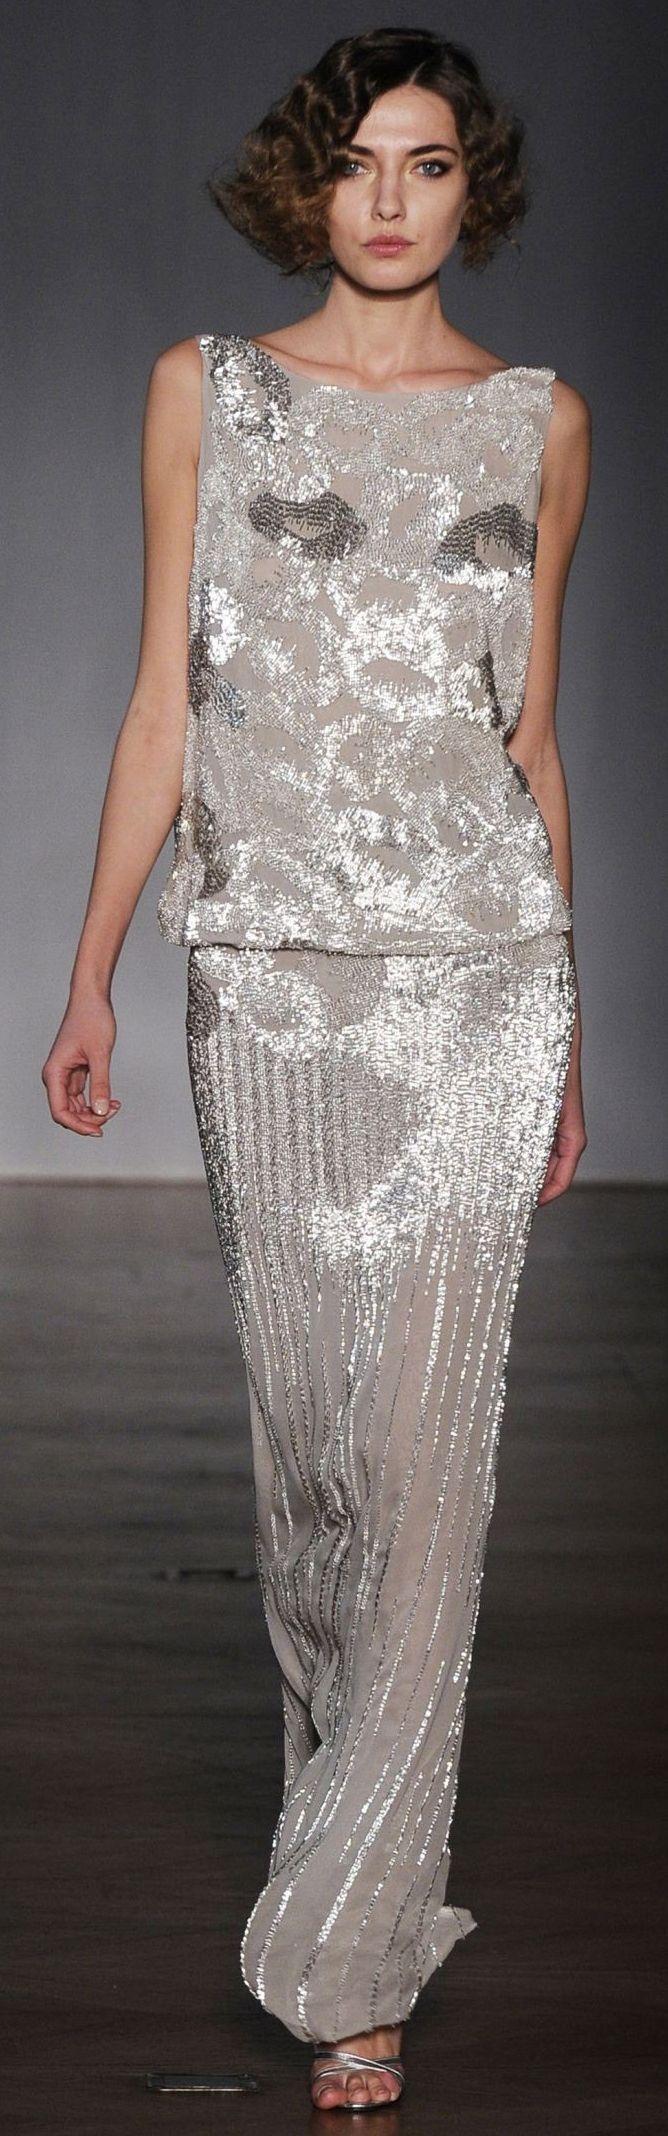 Dilek Hanif ~ Shimmering Evening Gown, Silver wedding hautness #brideswank